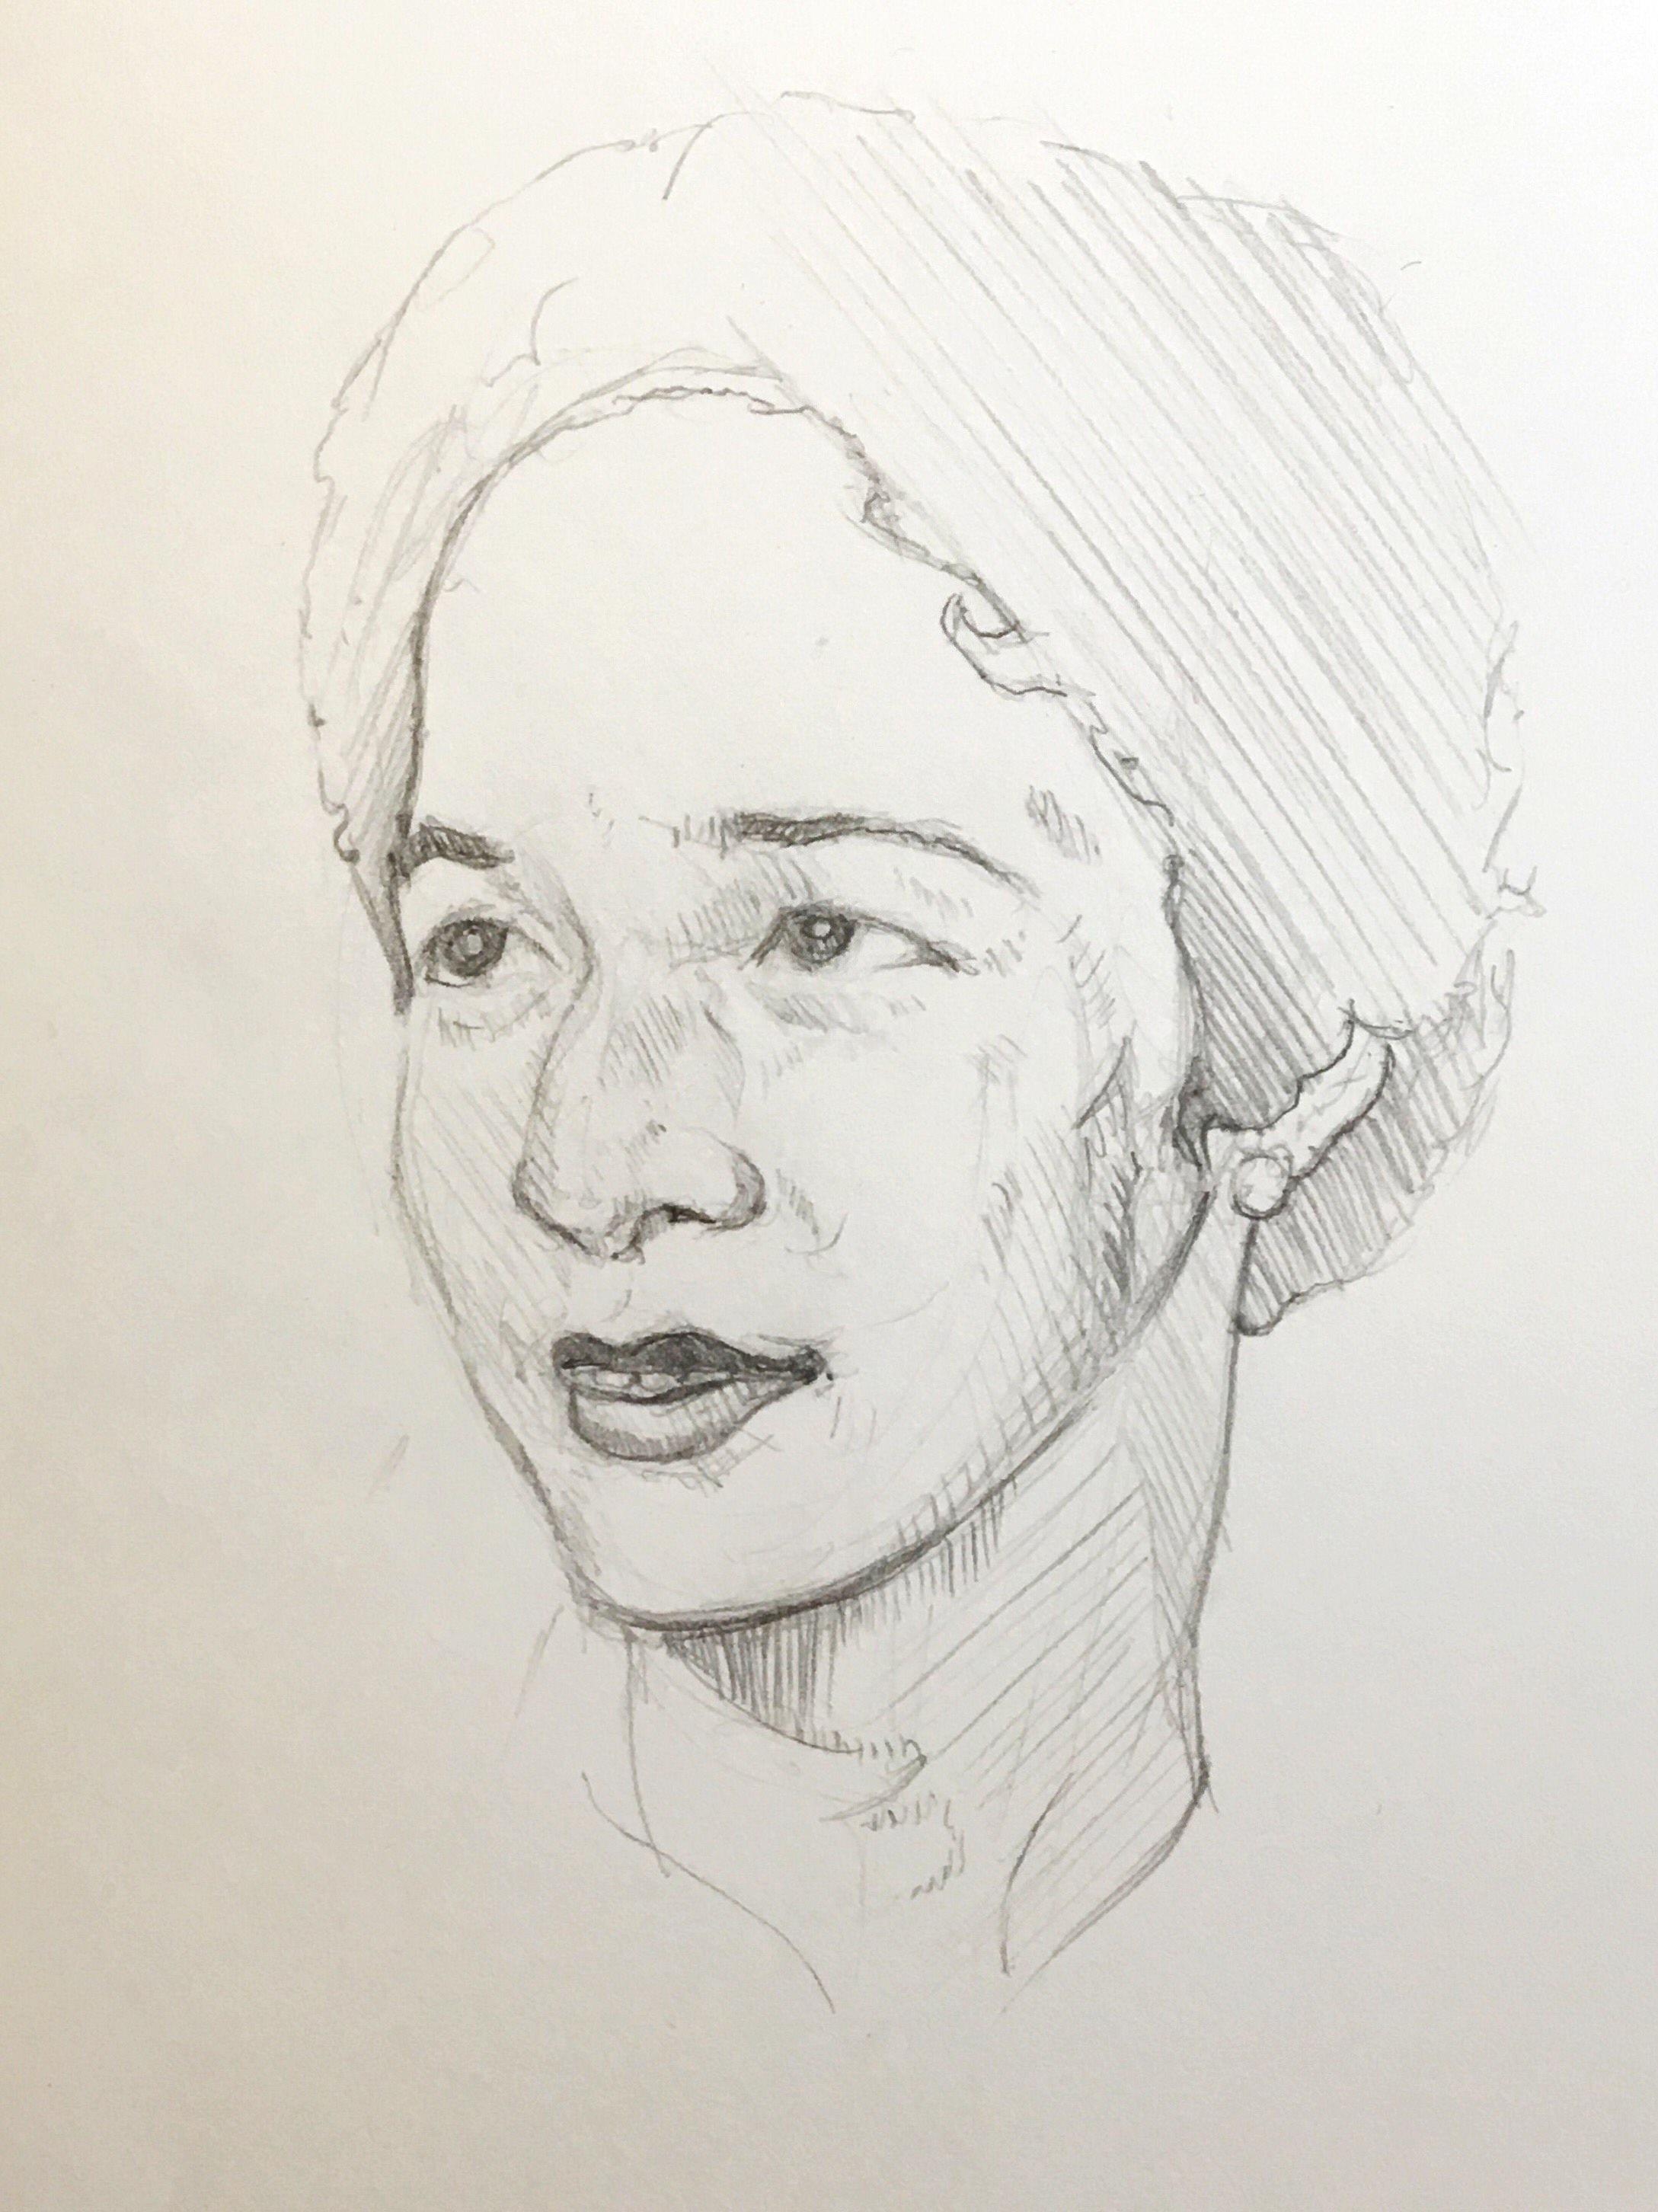 janes_mom_painting_study.jpg